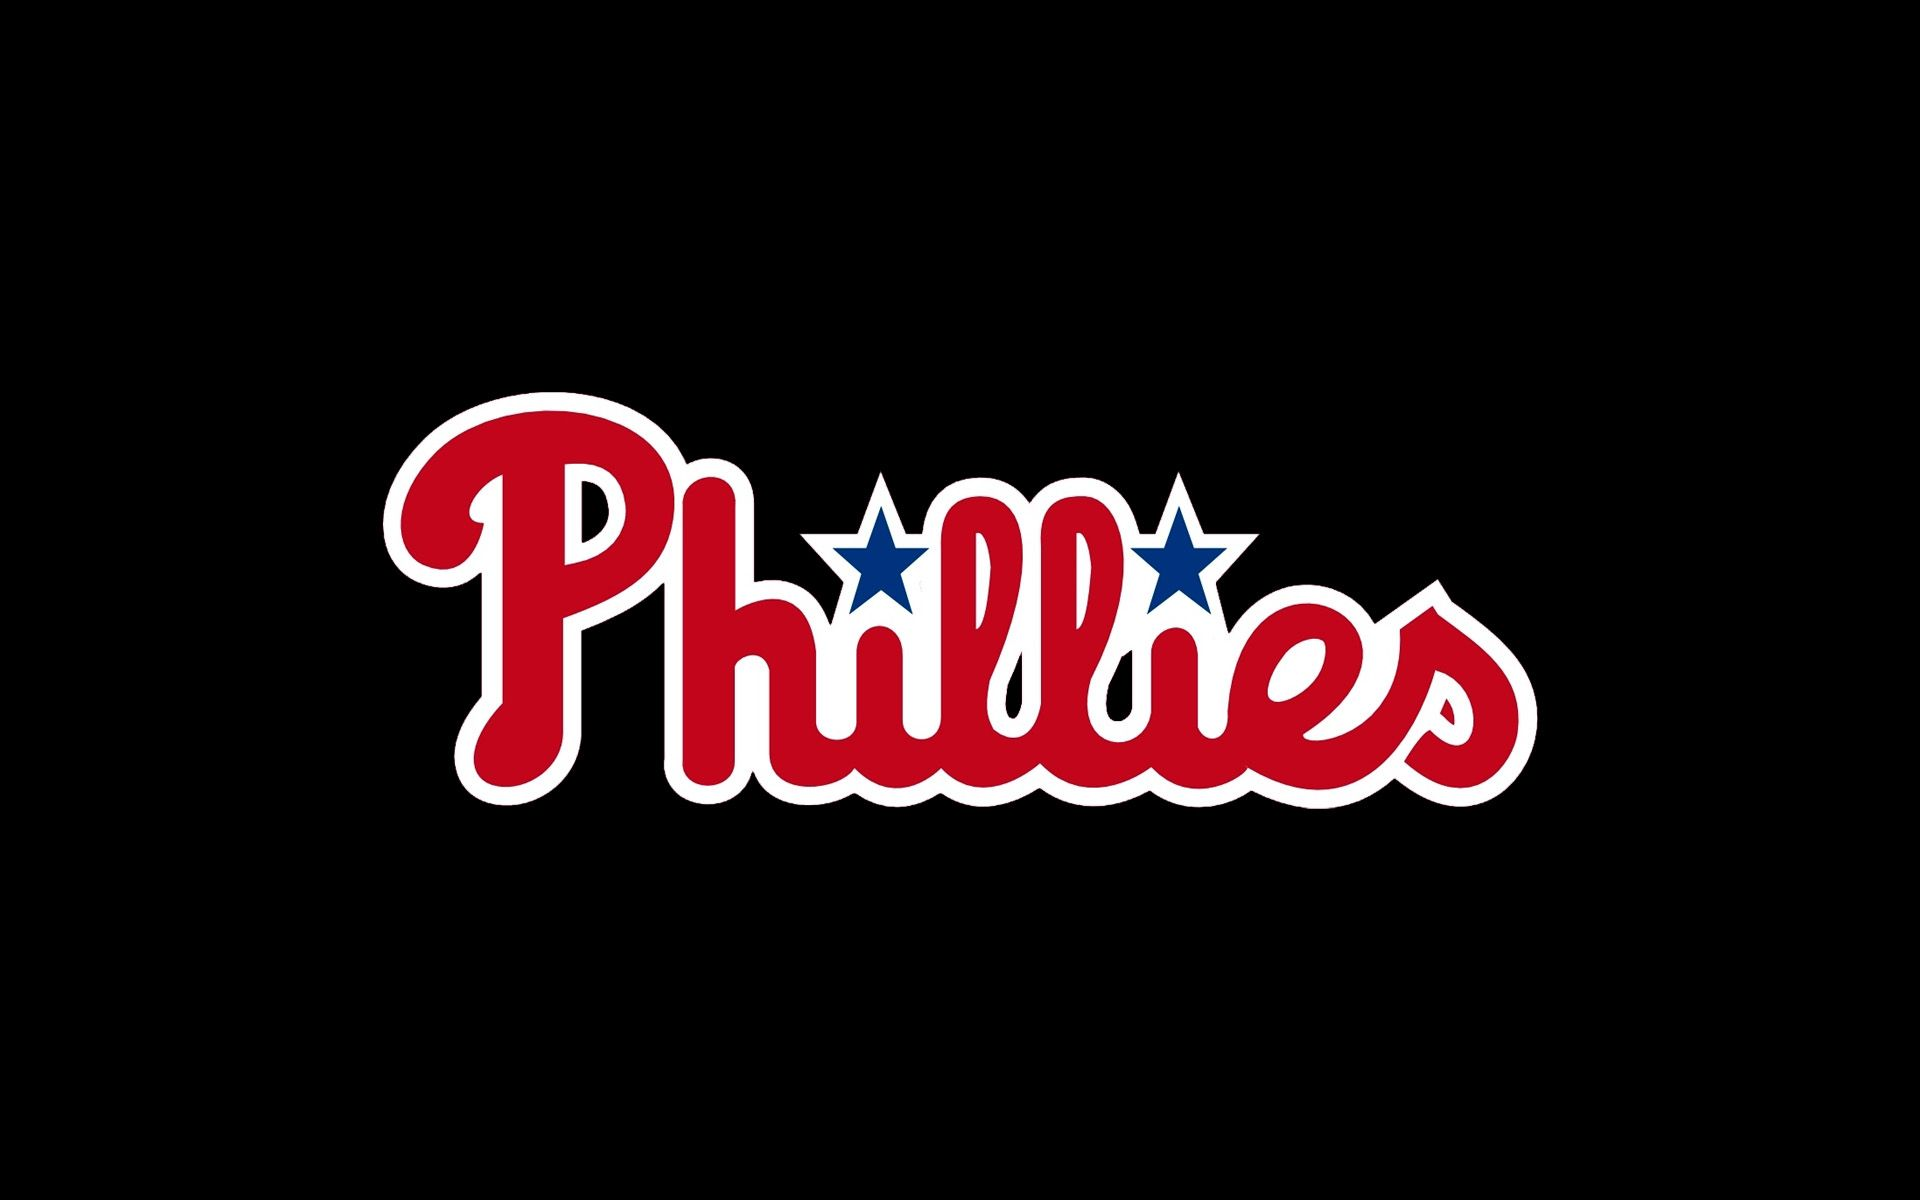 Philadelphia Phillies Logo Wallpapers - Wallpaper Cave